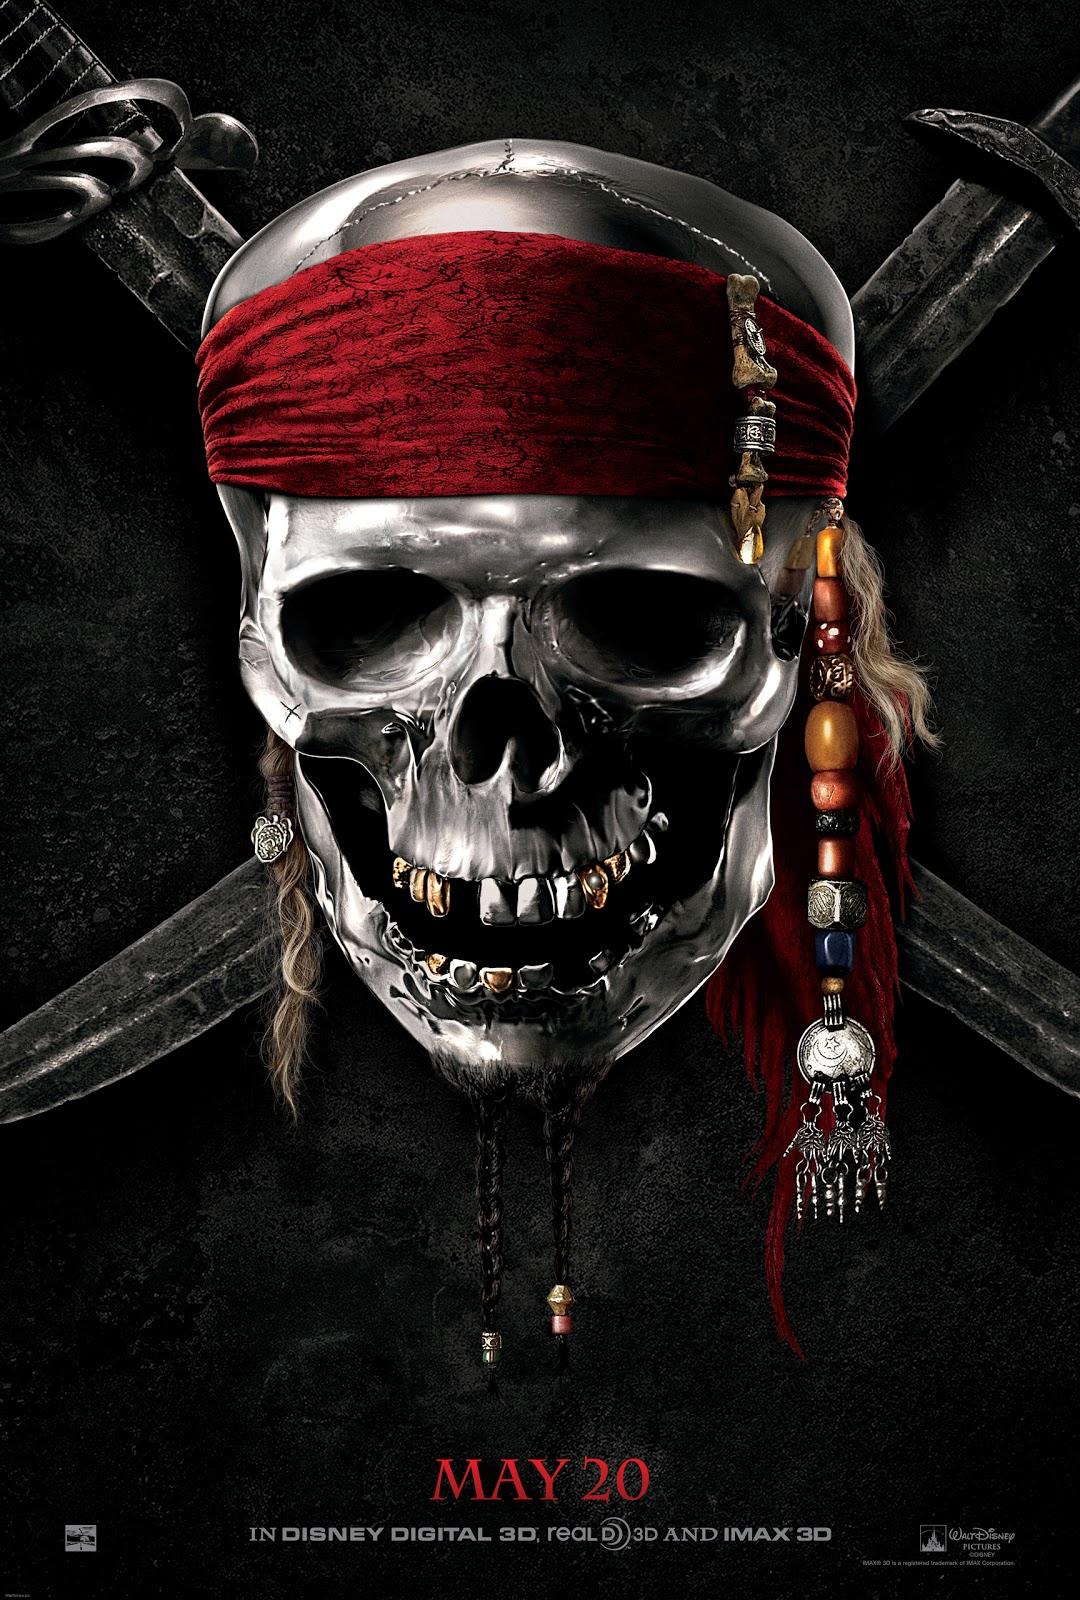 http://4.bp.blogspot.com/_203N03RKSAs/TVEyQbOHV1I/AAAAAAAAA74/ORFrVS_W_l0/s1600/pirates_of_the_caribbean_on_stranger_tides_teaser_poster_hi-res_01.jpg